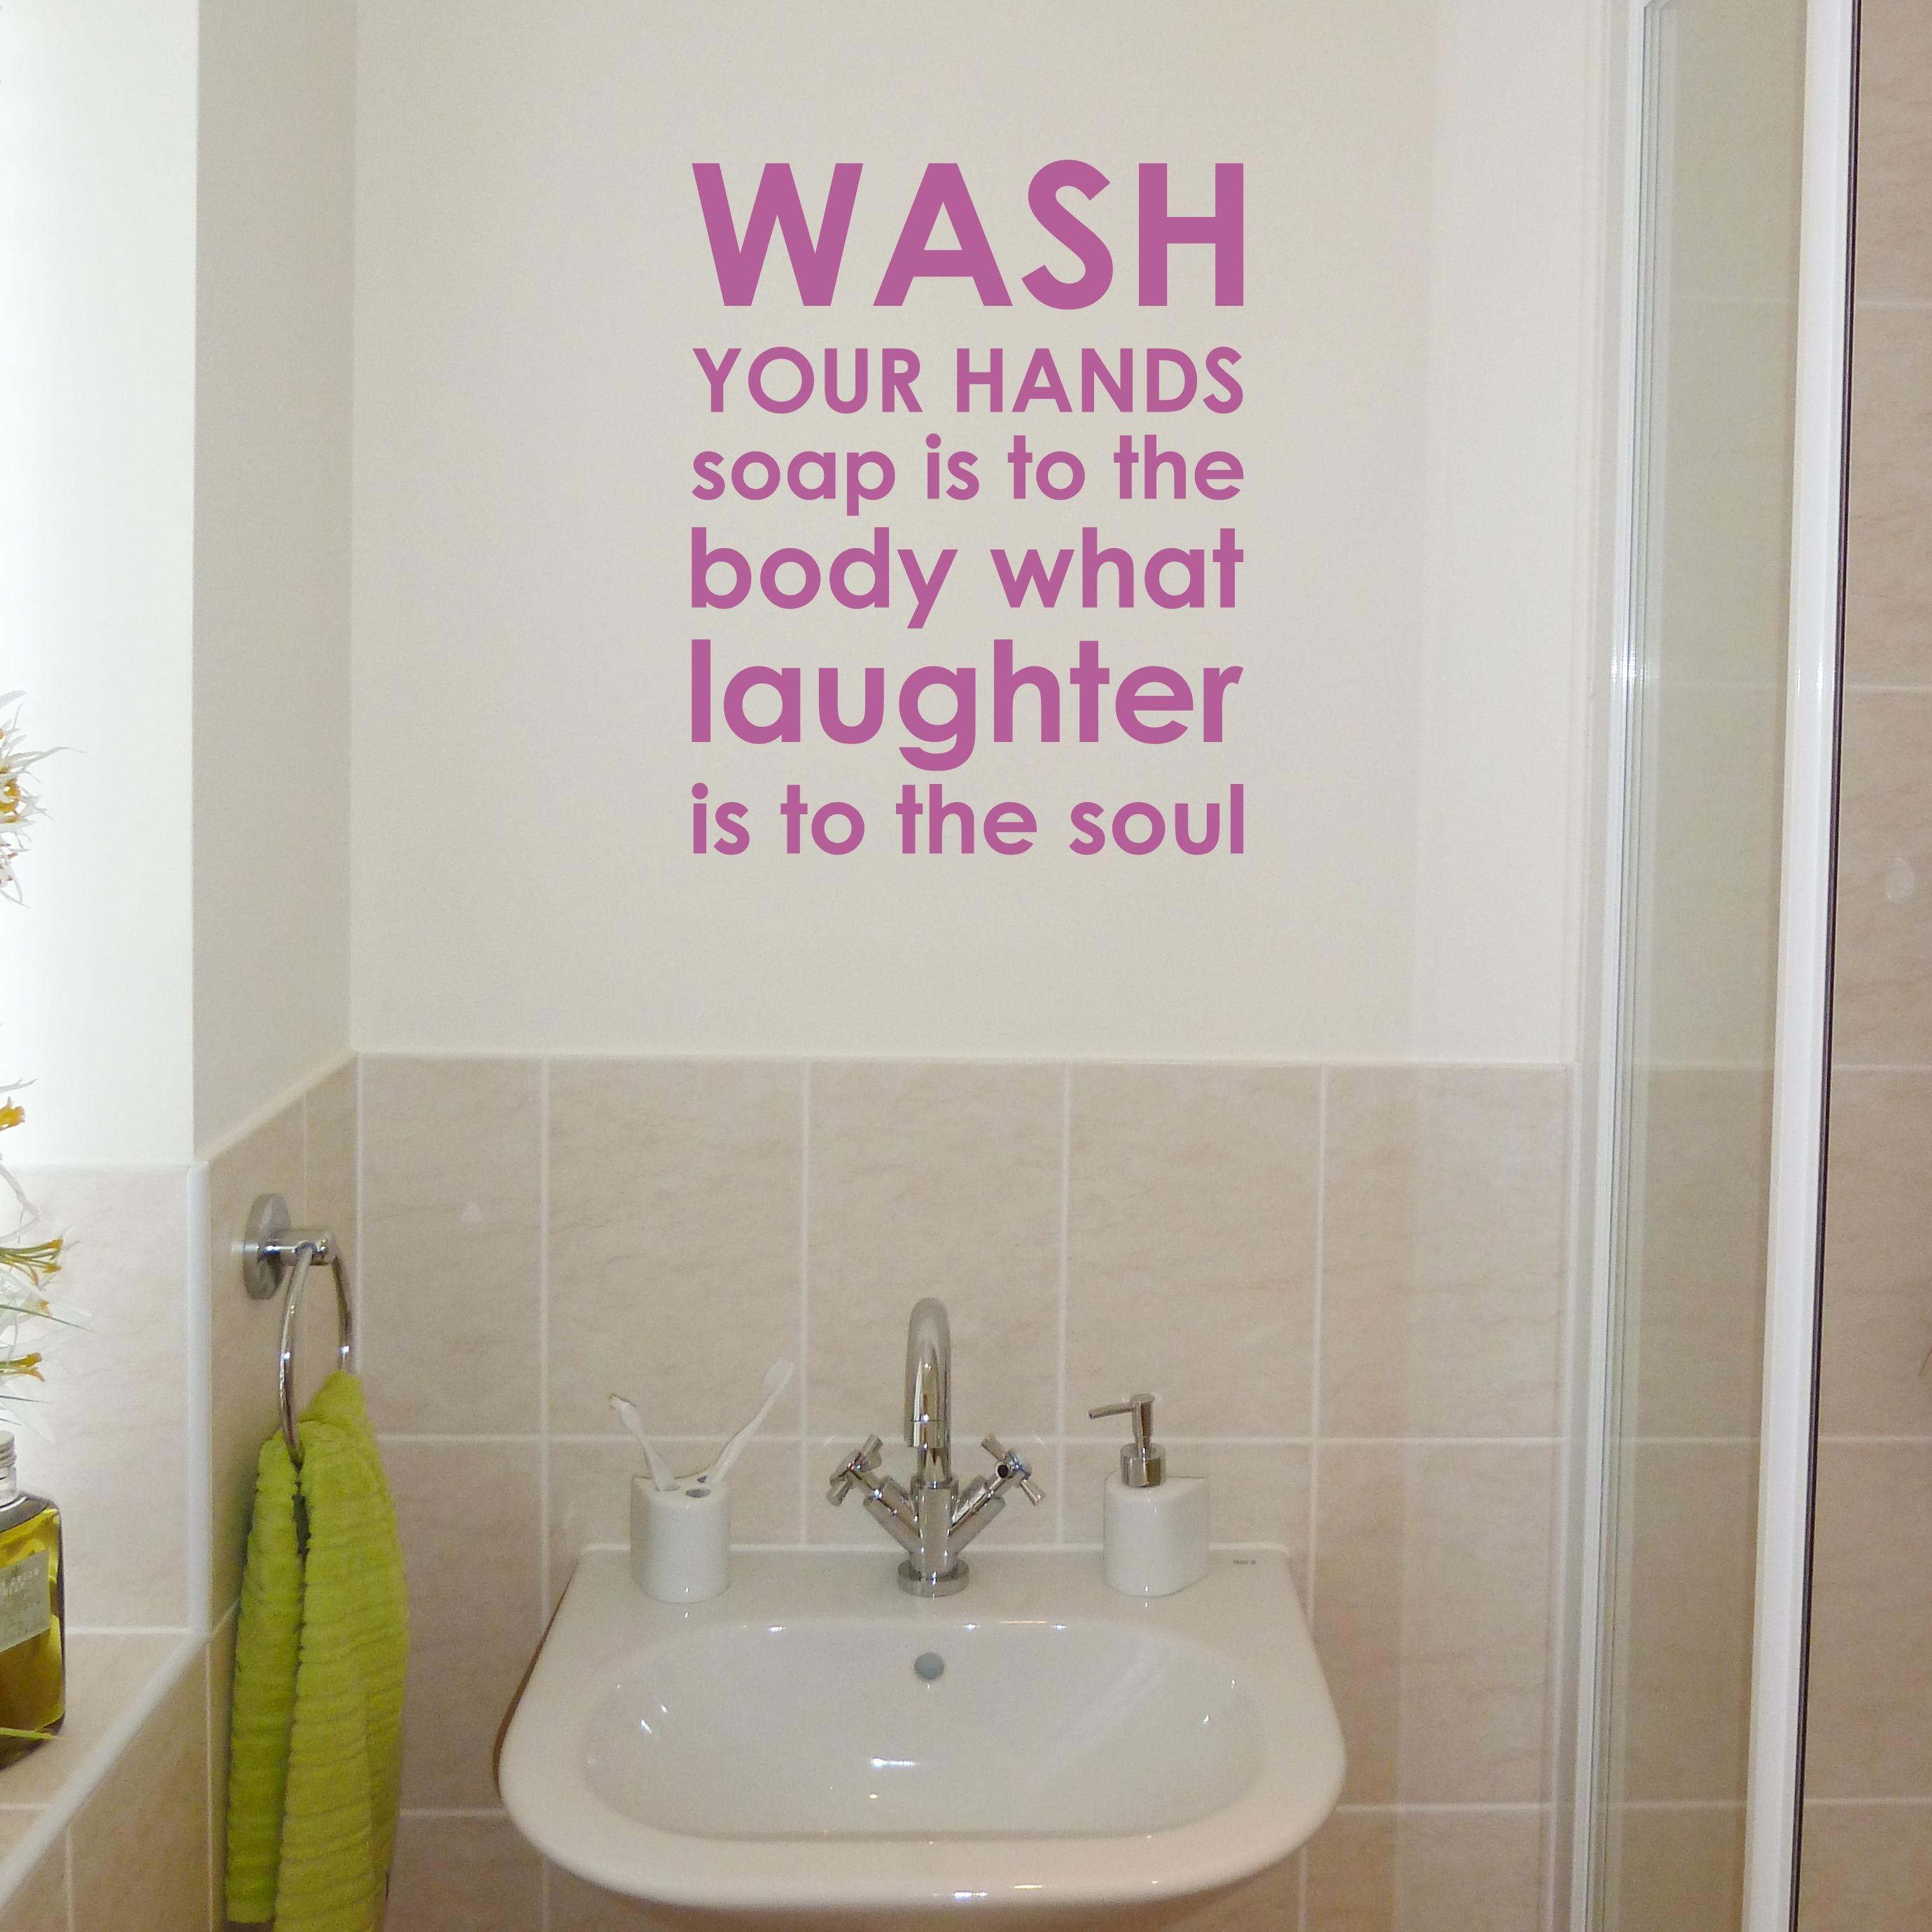 Best Diy Bathroom Wall Art On With Hd Resolution 2178X1452 Pixels Within Purple Bathroom Wall Art (Image 11 of 20)